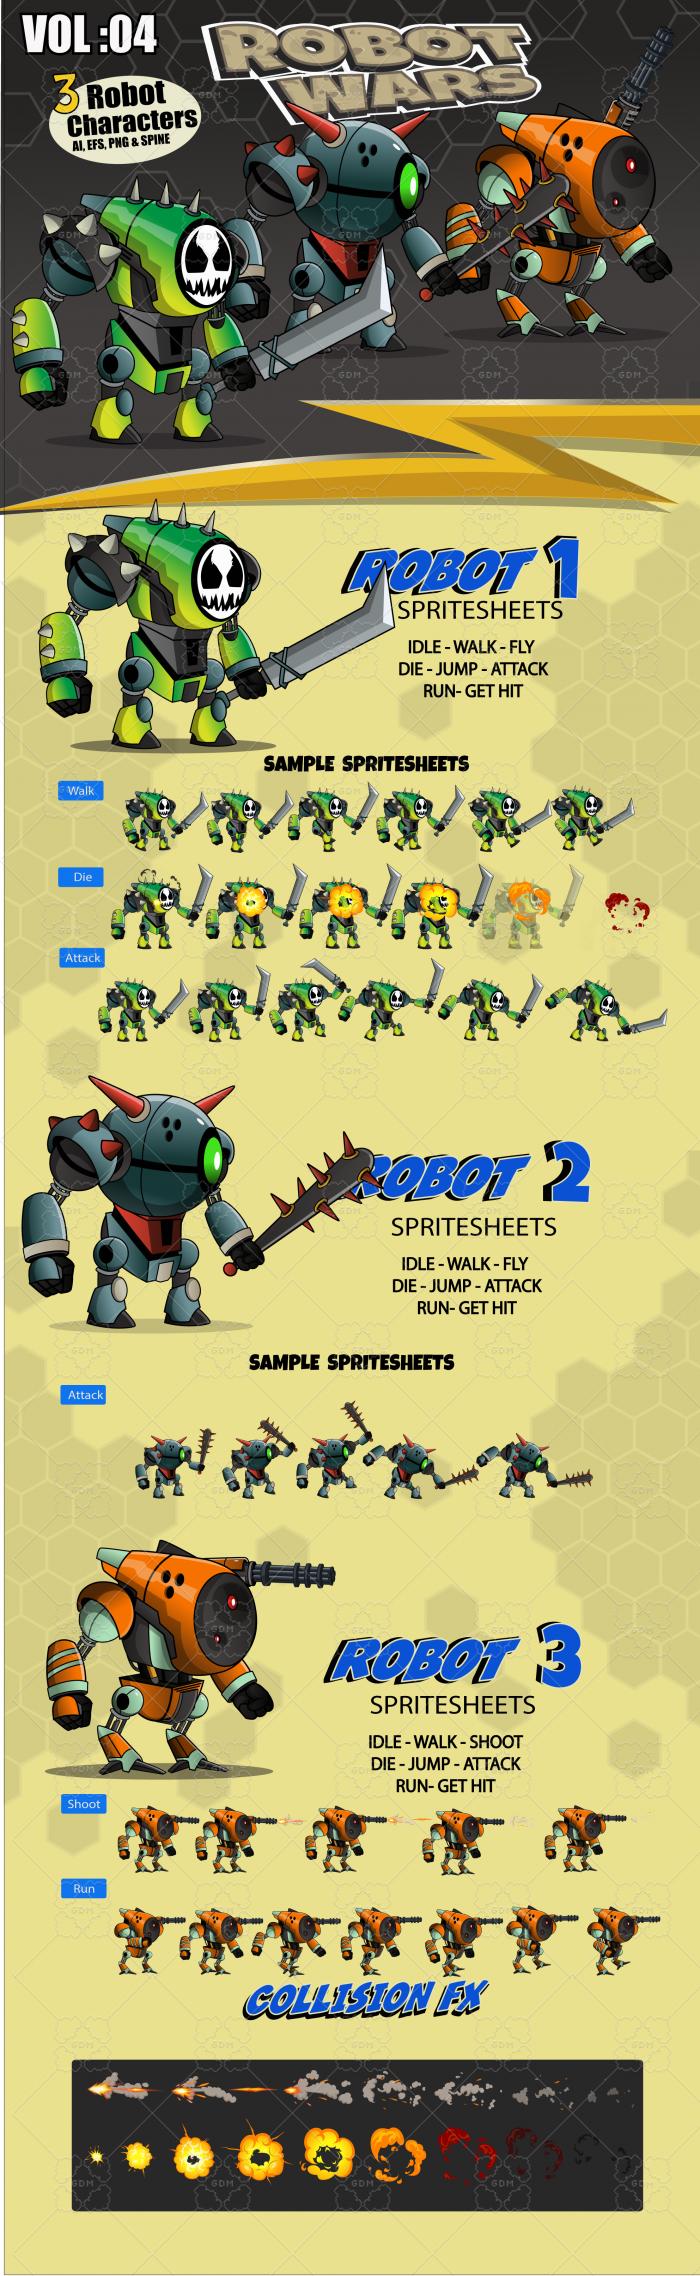 Robot Wars Character Vol: 04